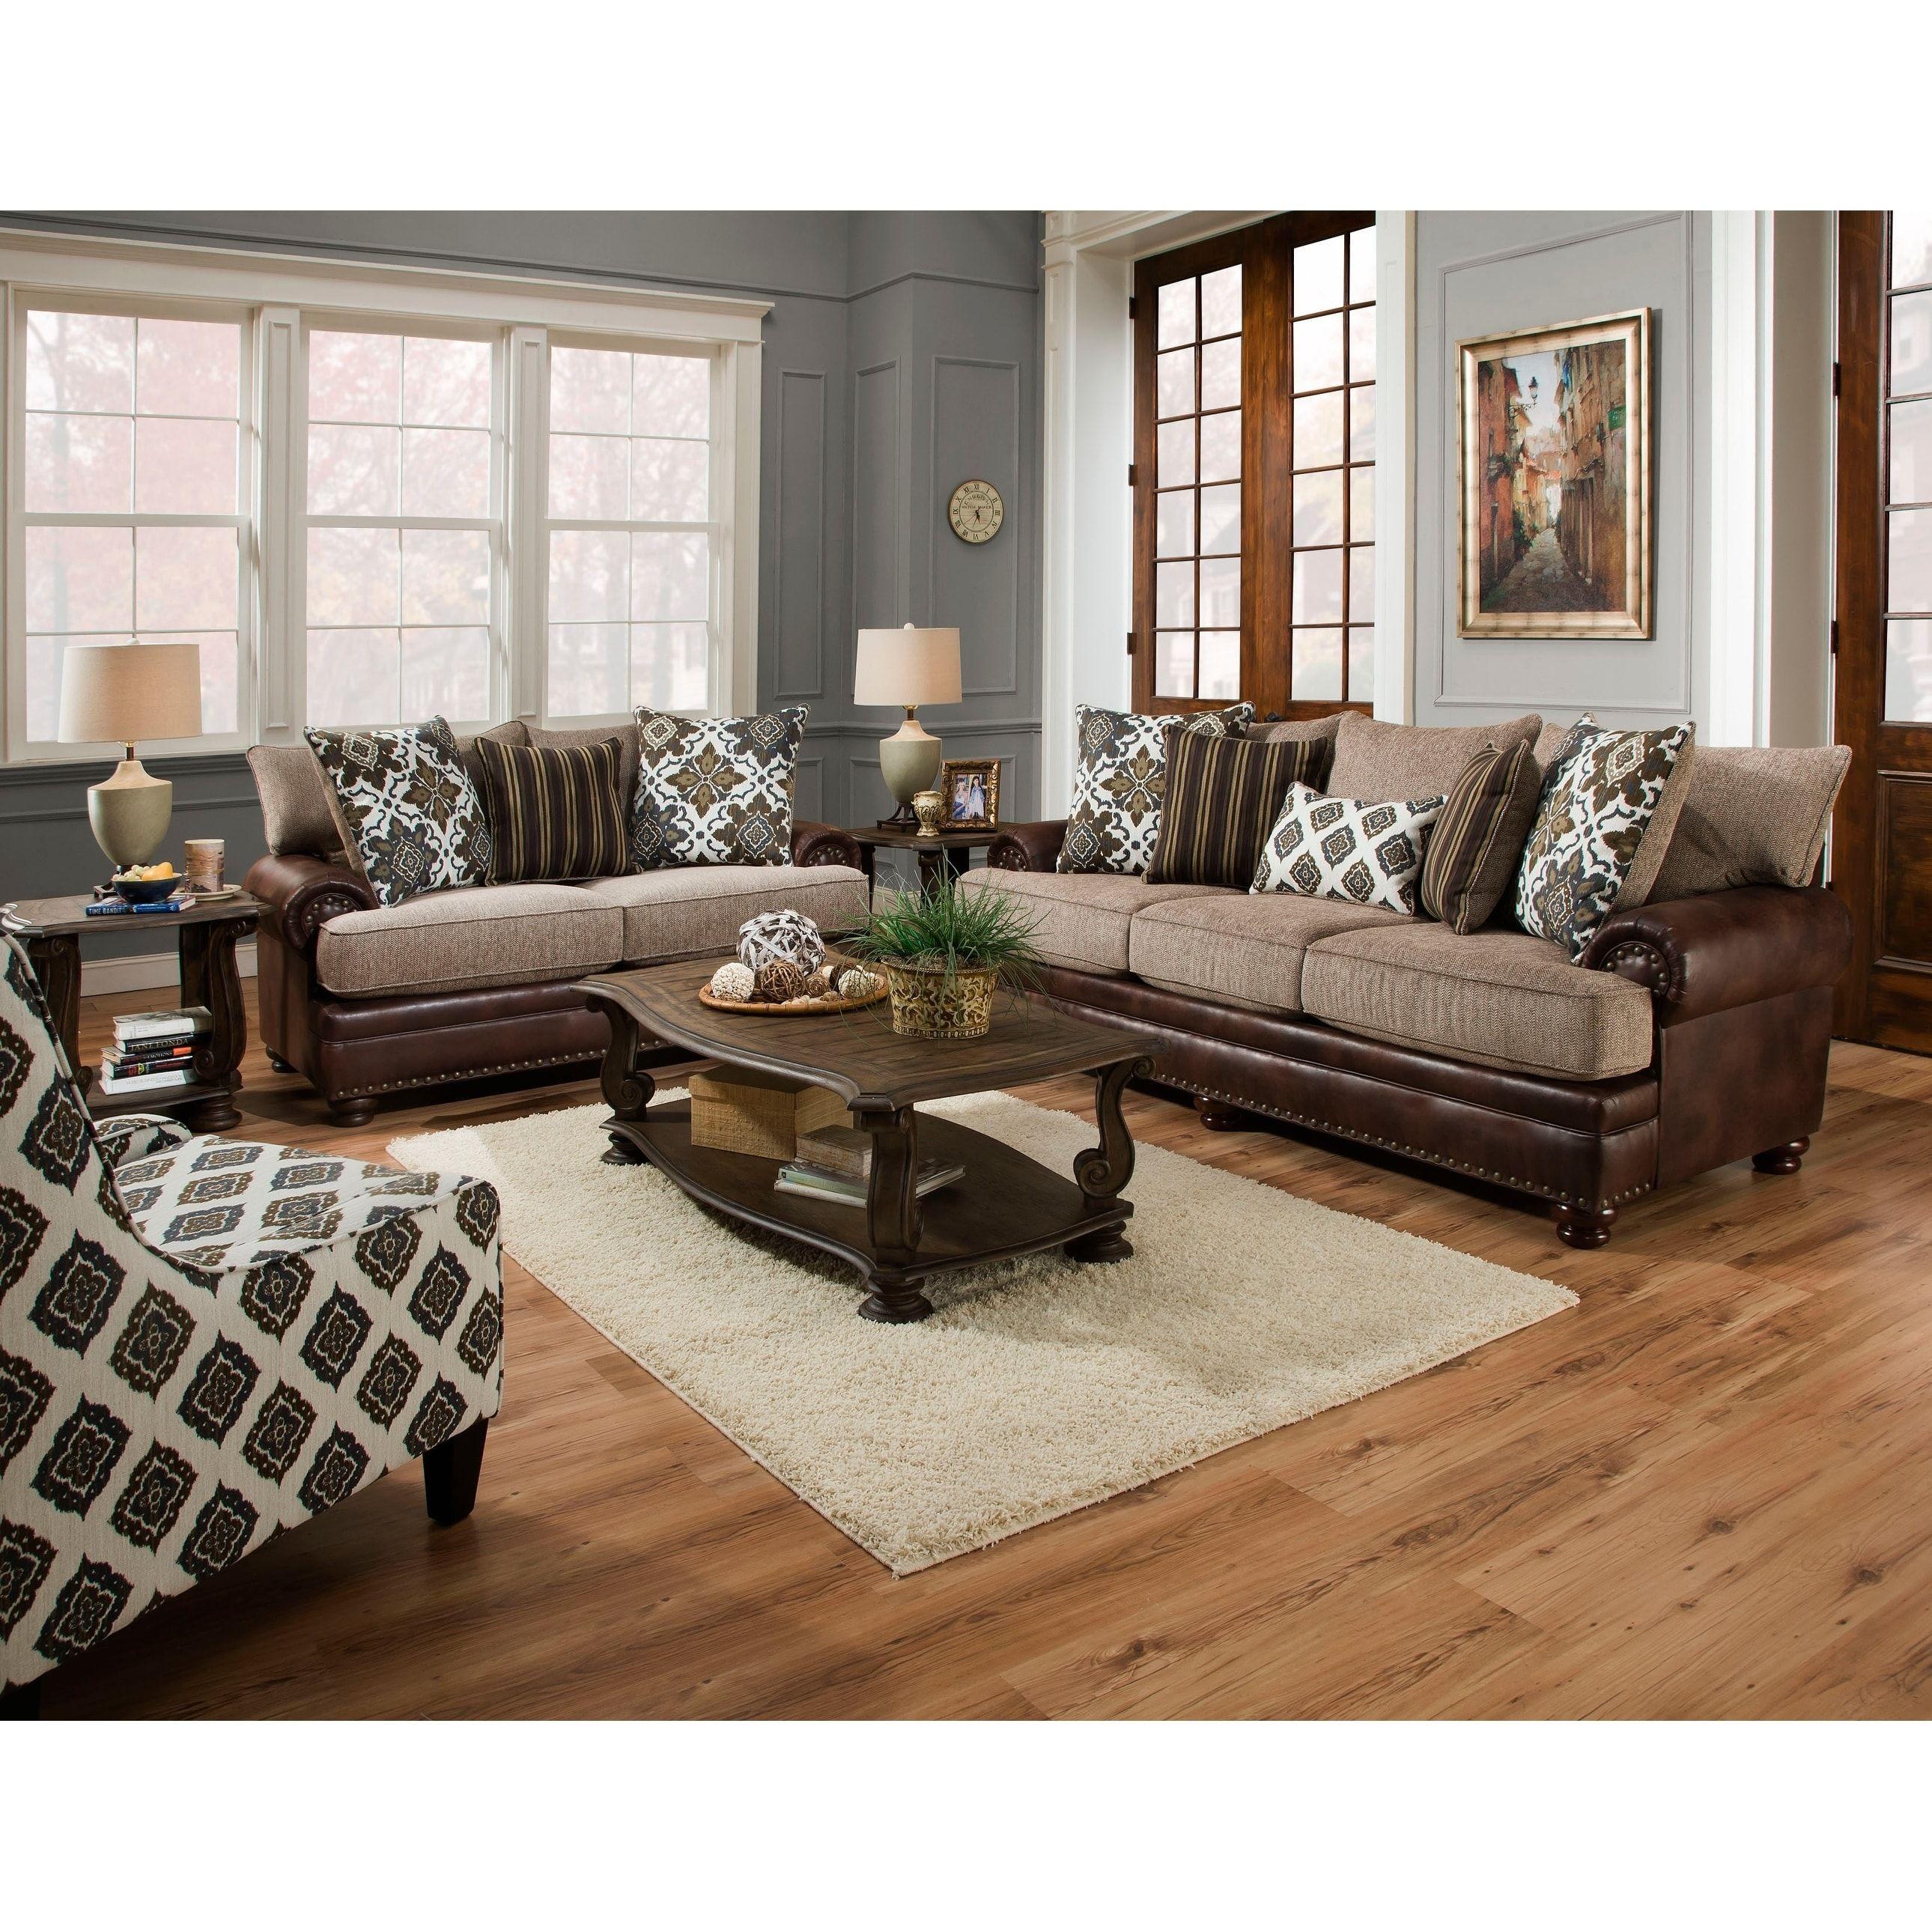 Our Best Living Room Furniture Deals Brown Living Room 3 Piece Living Room Set Living Room Sets